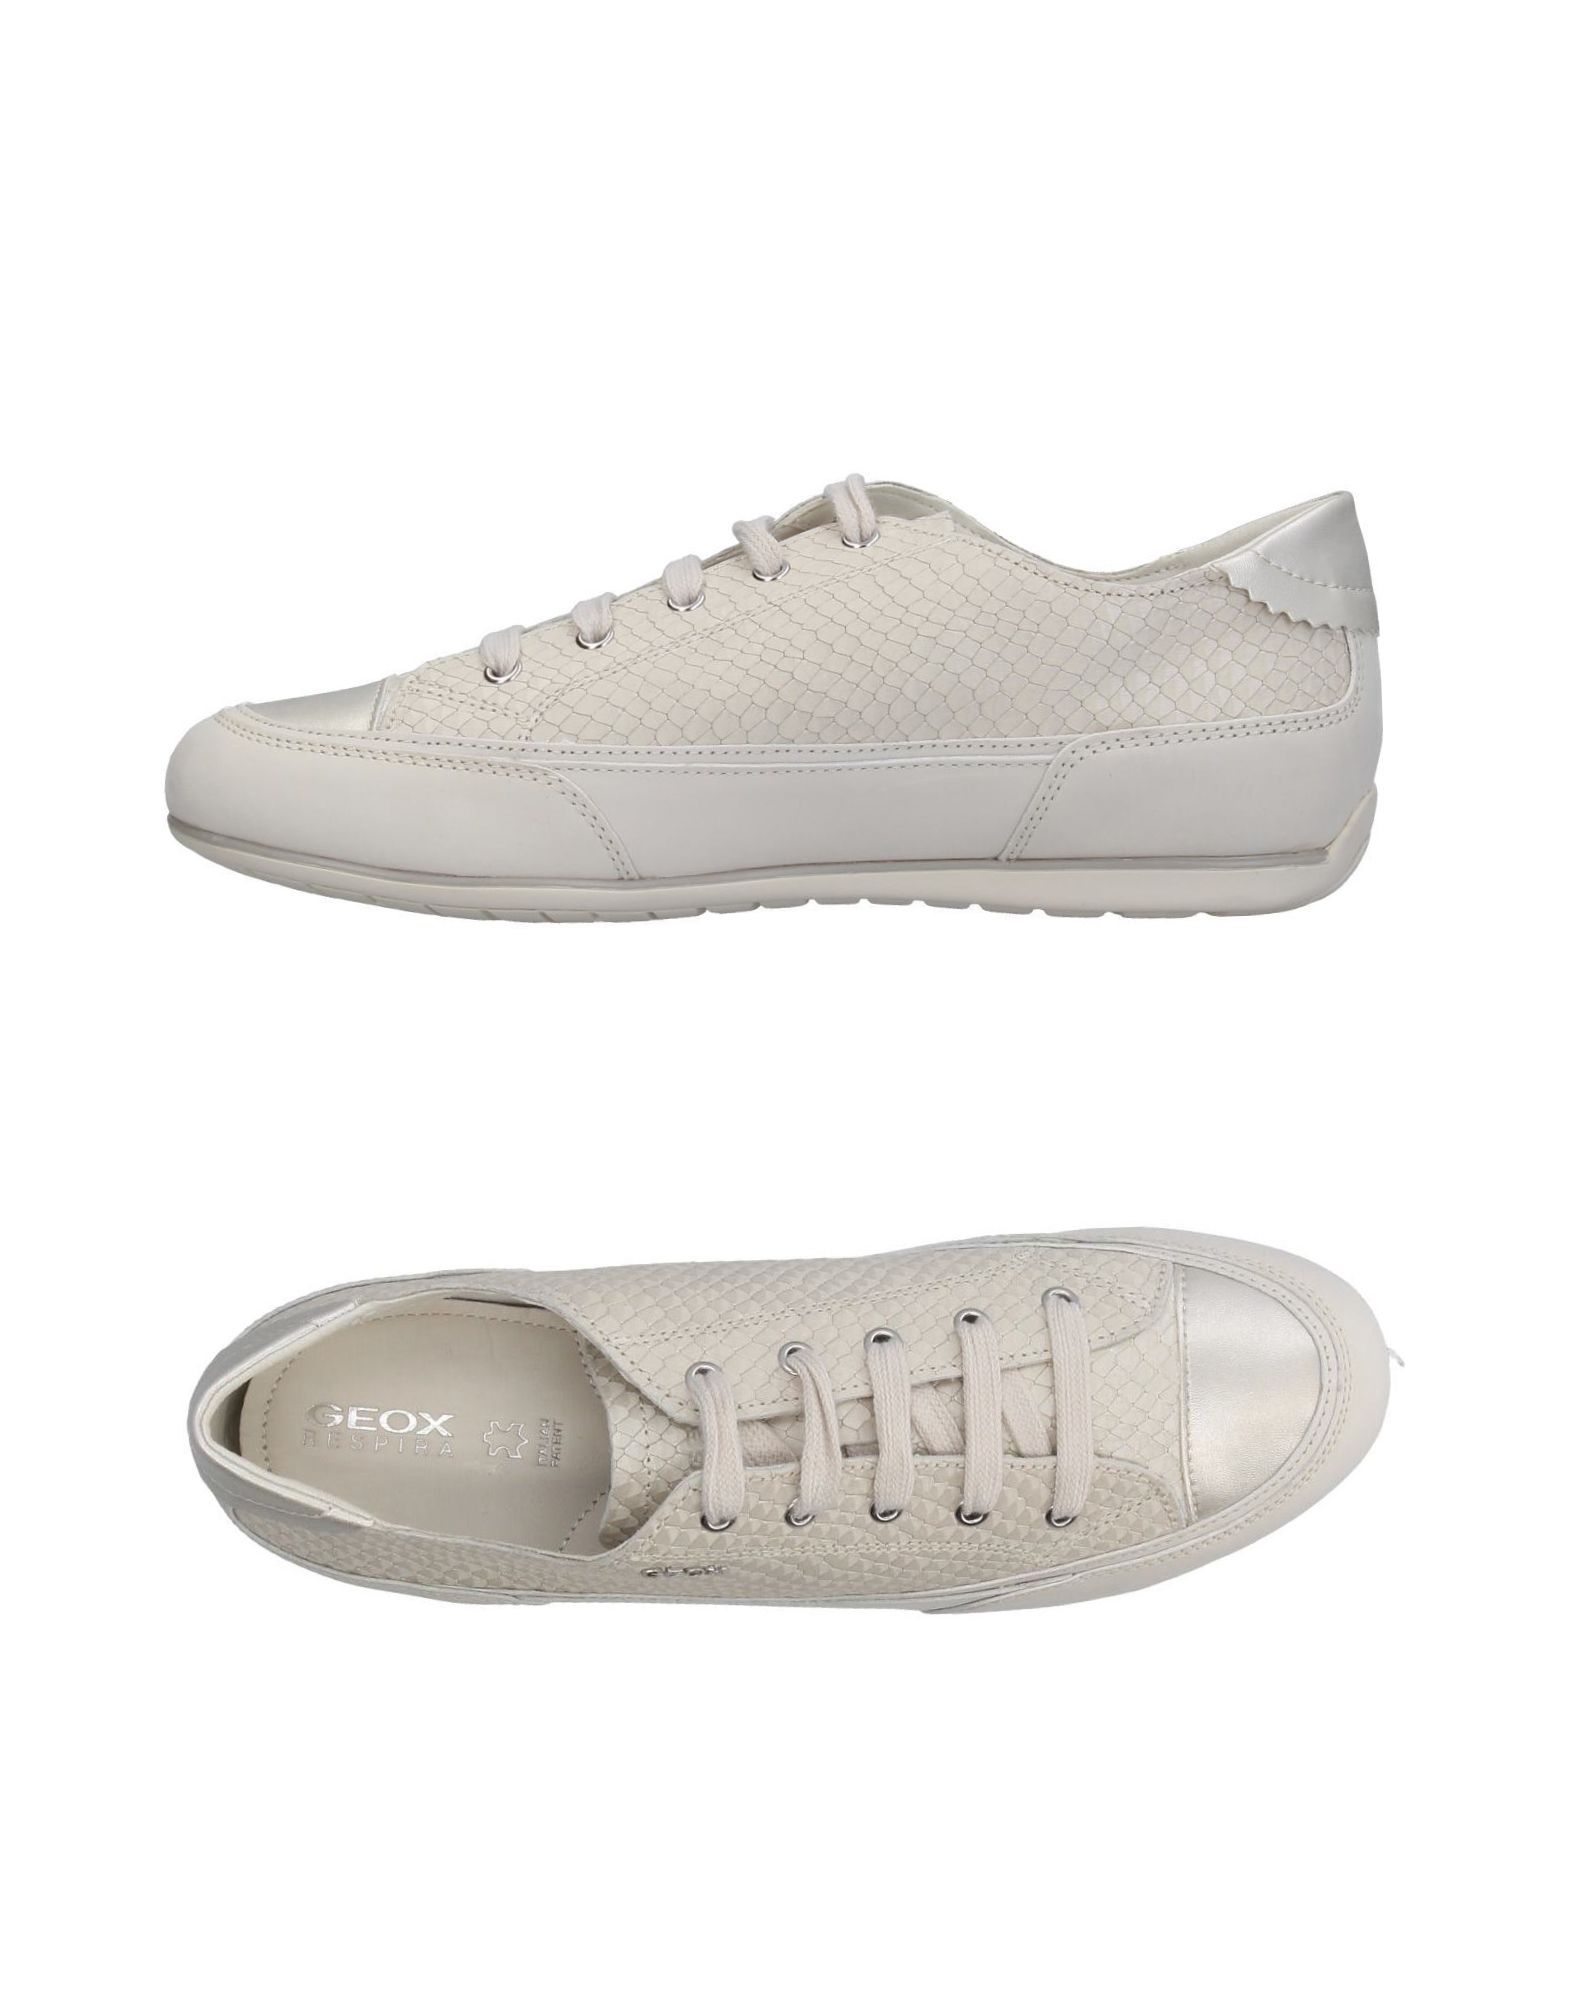 Geox Sneakers Damen  11391050RH Gute Qualität beliebte Schuhe